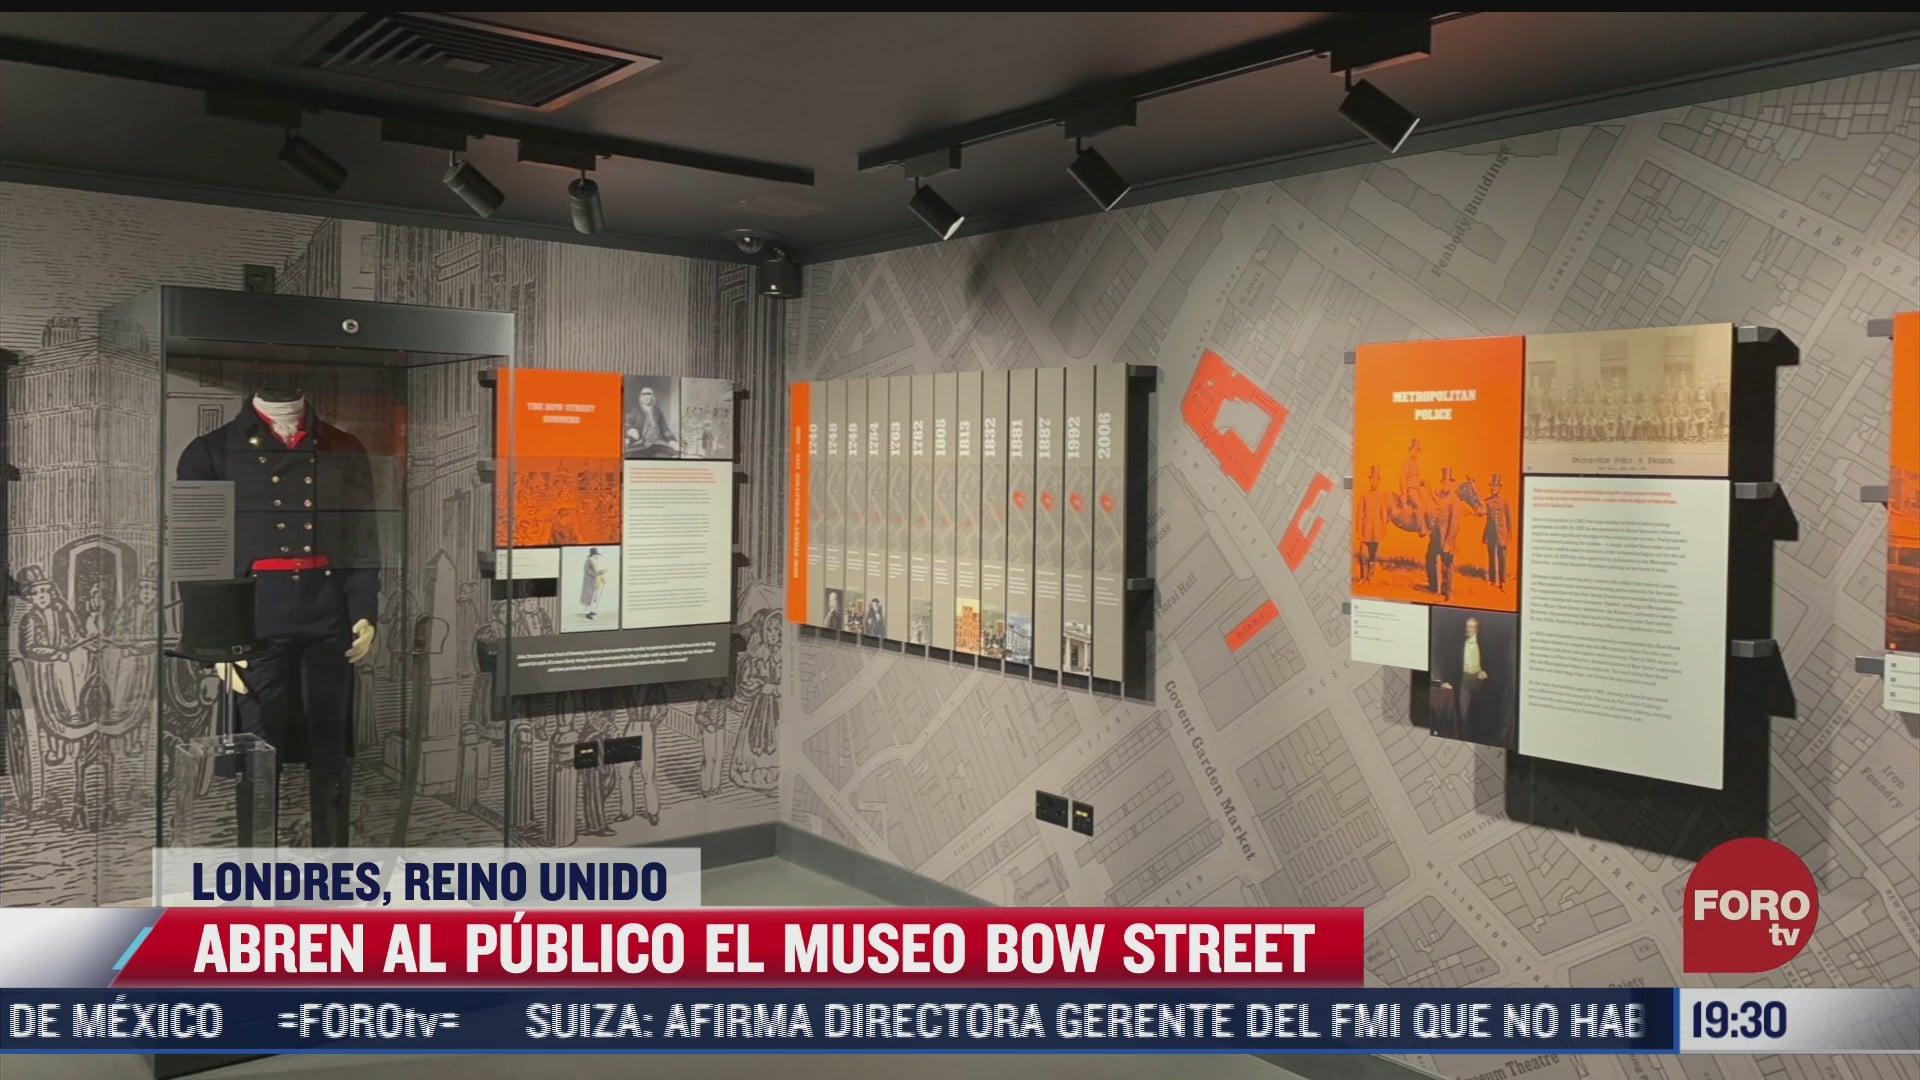 abren al publico museo de bow street